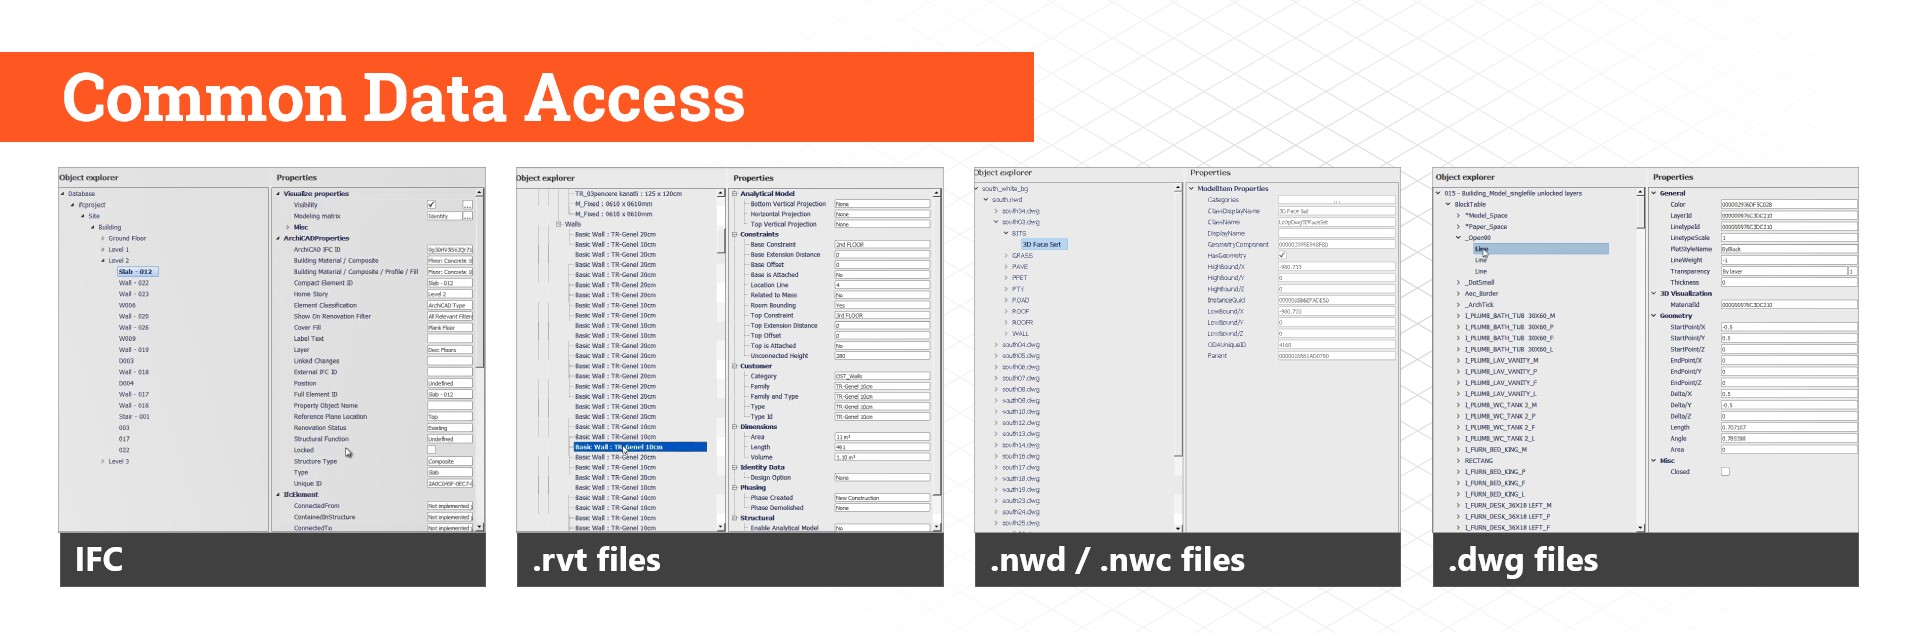 Common Data Access